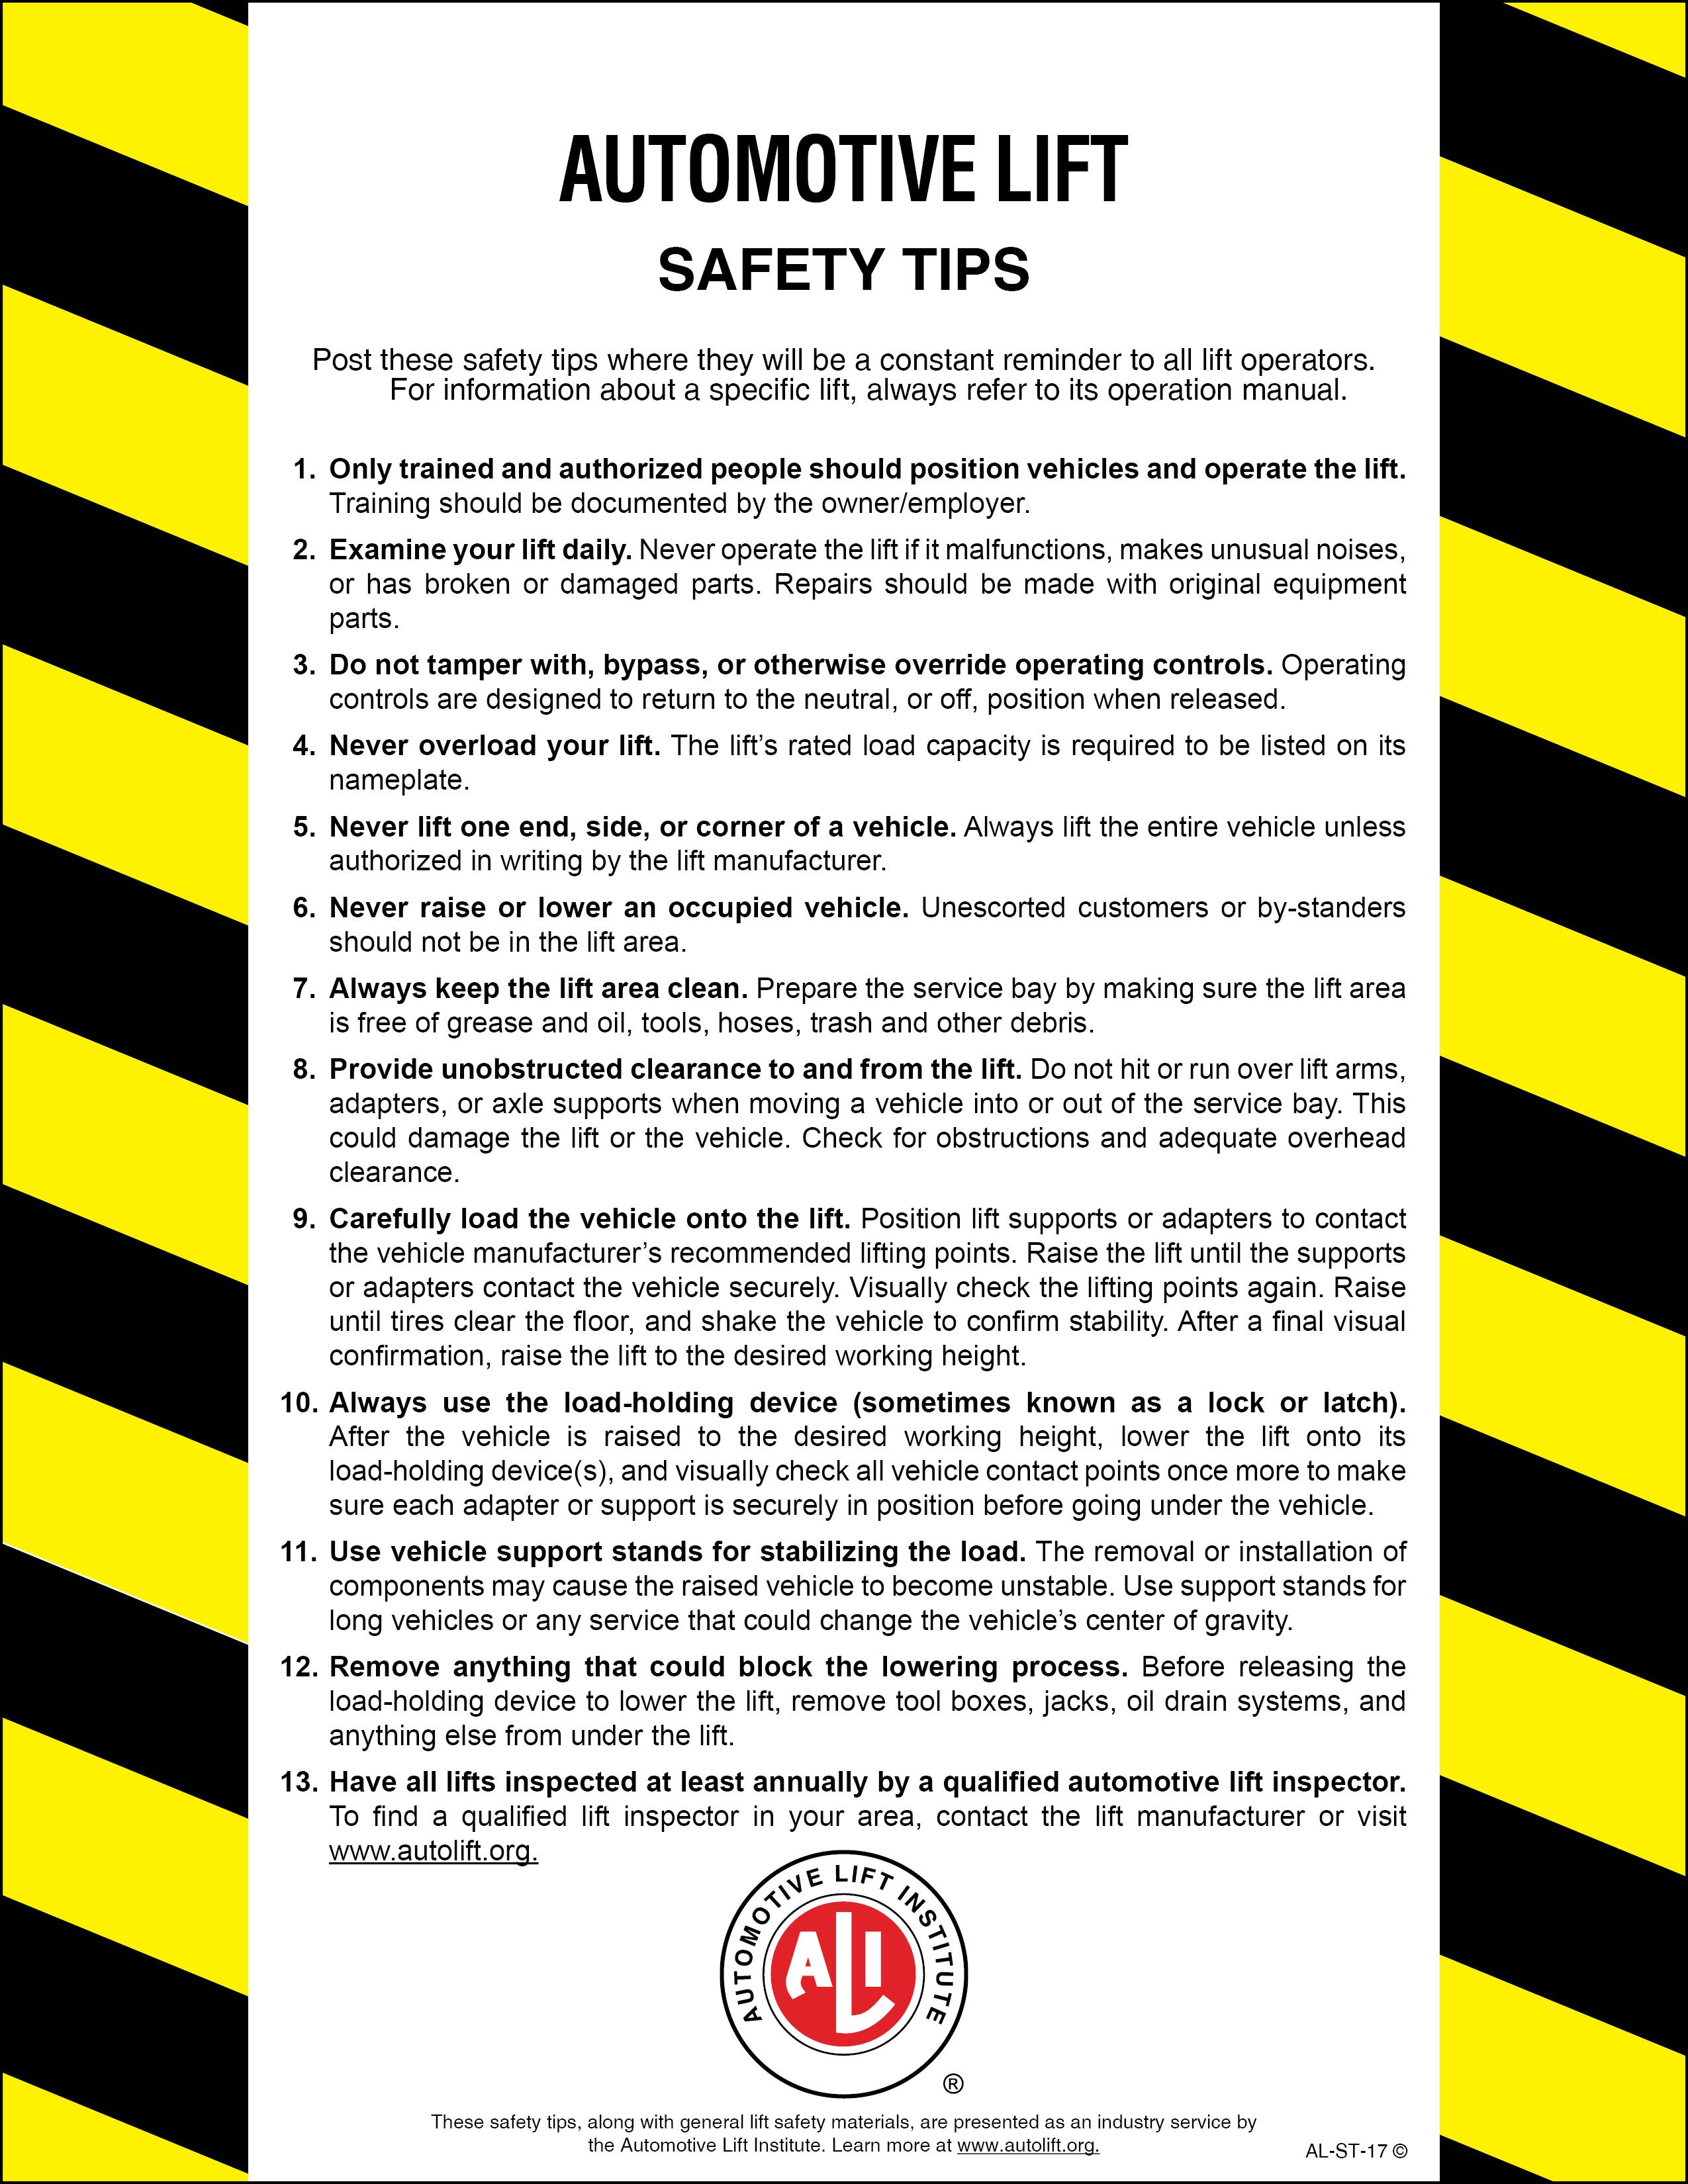 Automotive Lift Safety : Automotive lift industry safety tips card